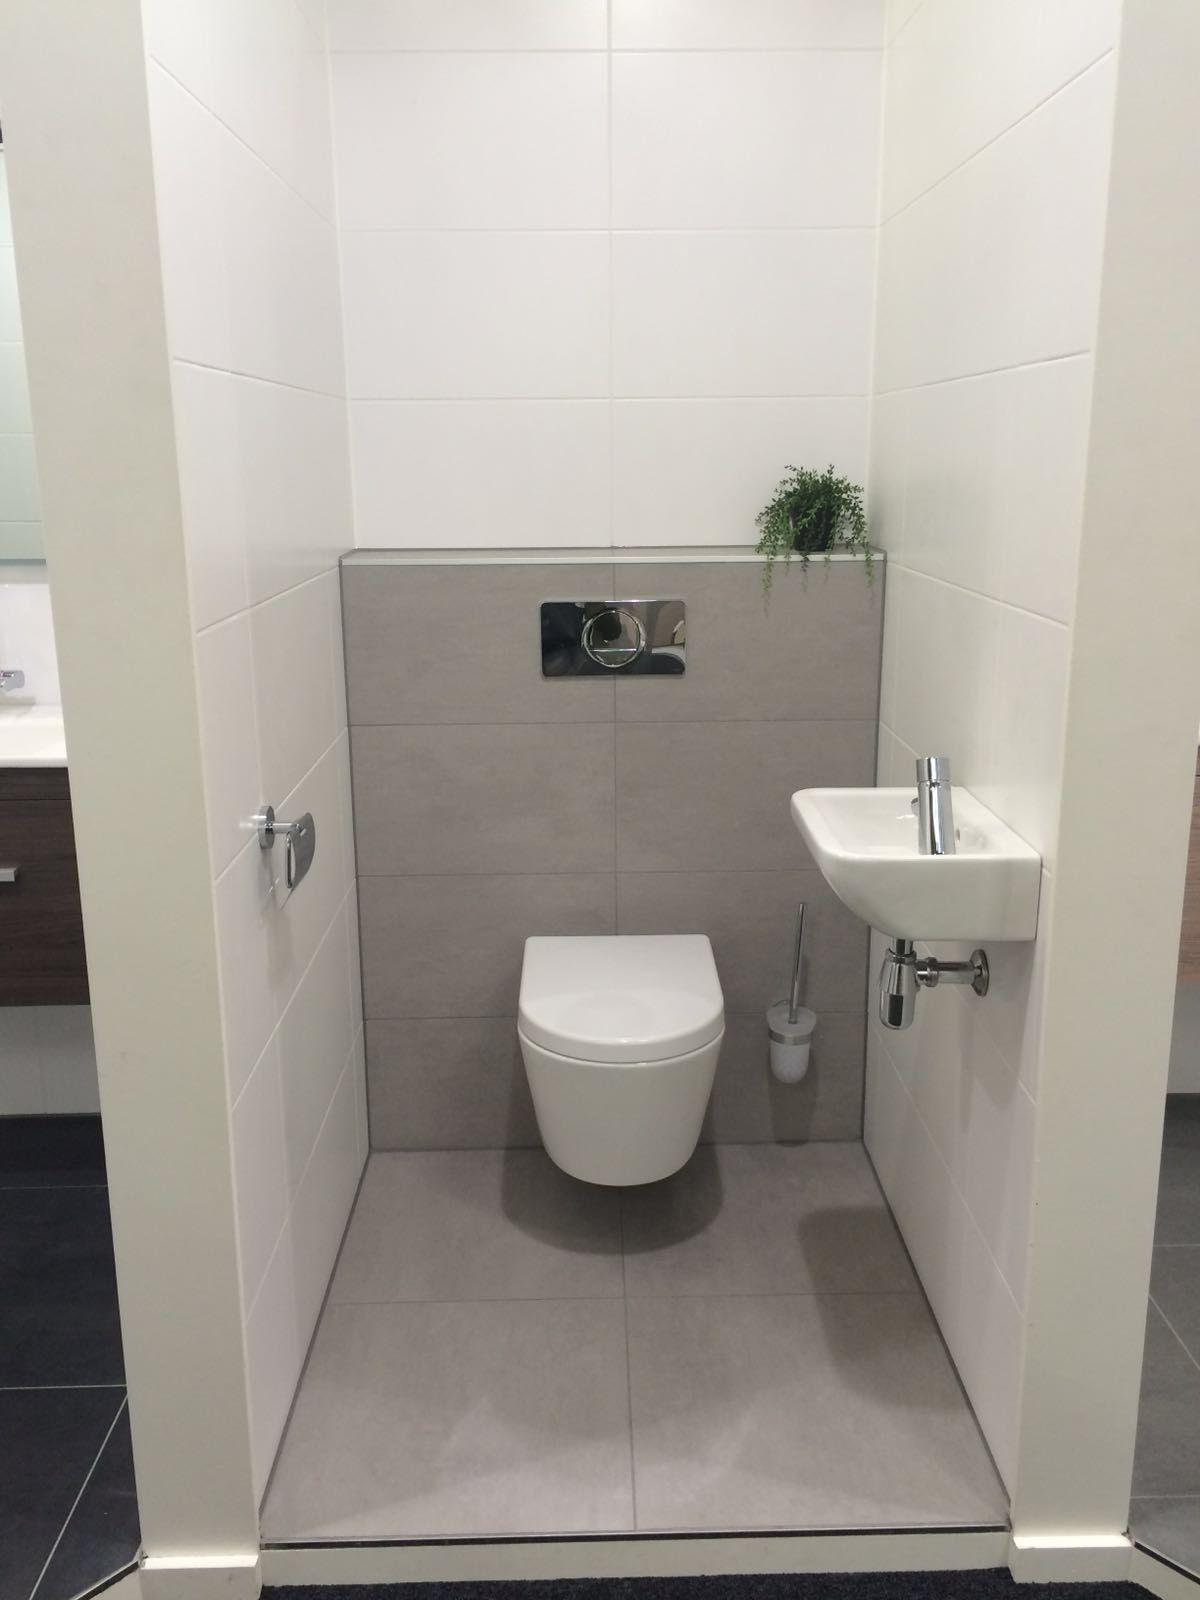 Hellgrau Bathroom Toilet Wc Badkamer Muurtje Toiletpot Mosa Tegels